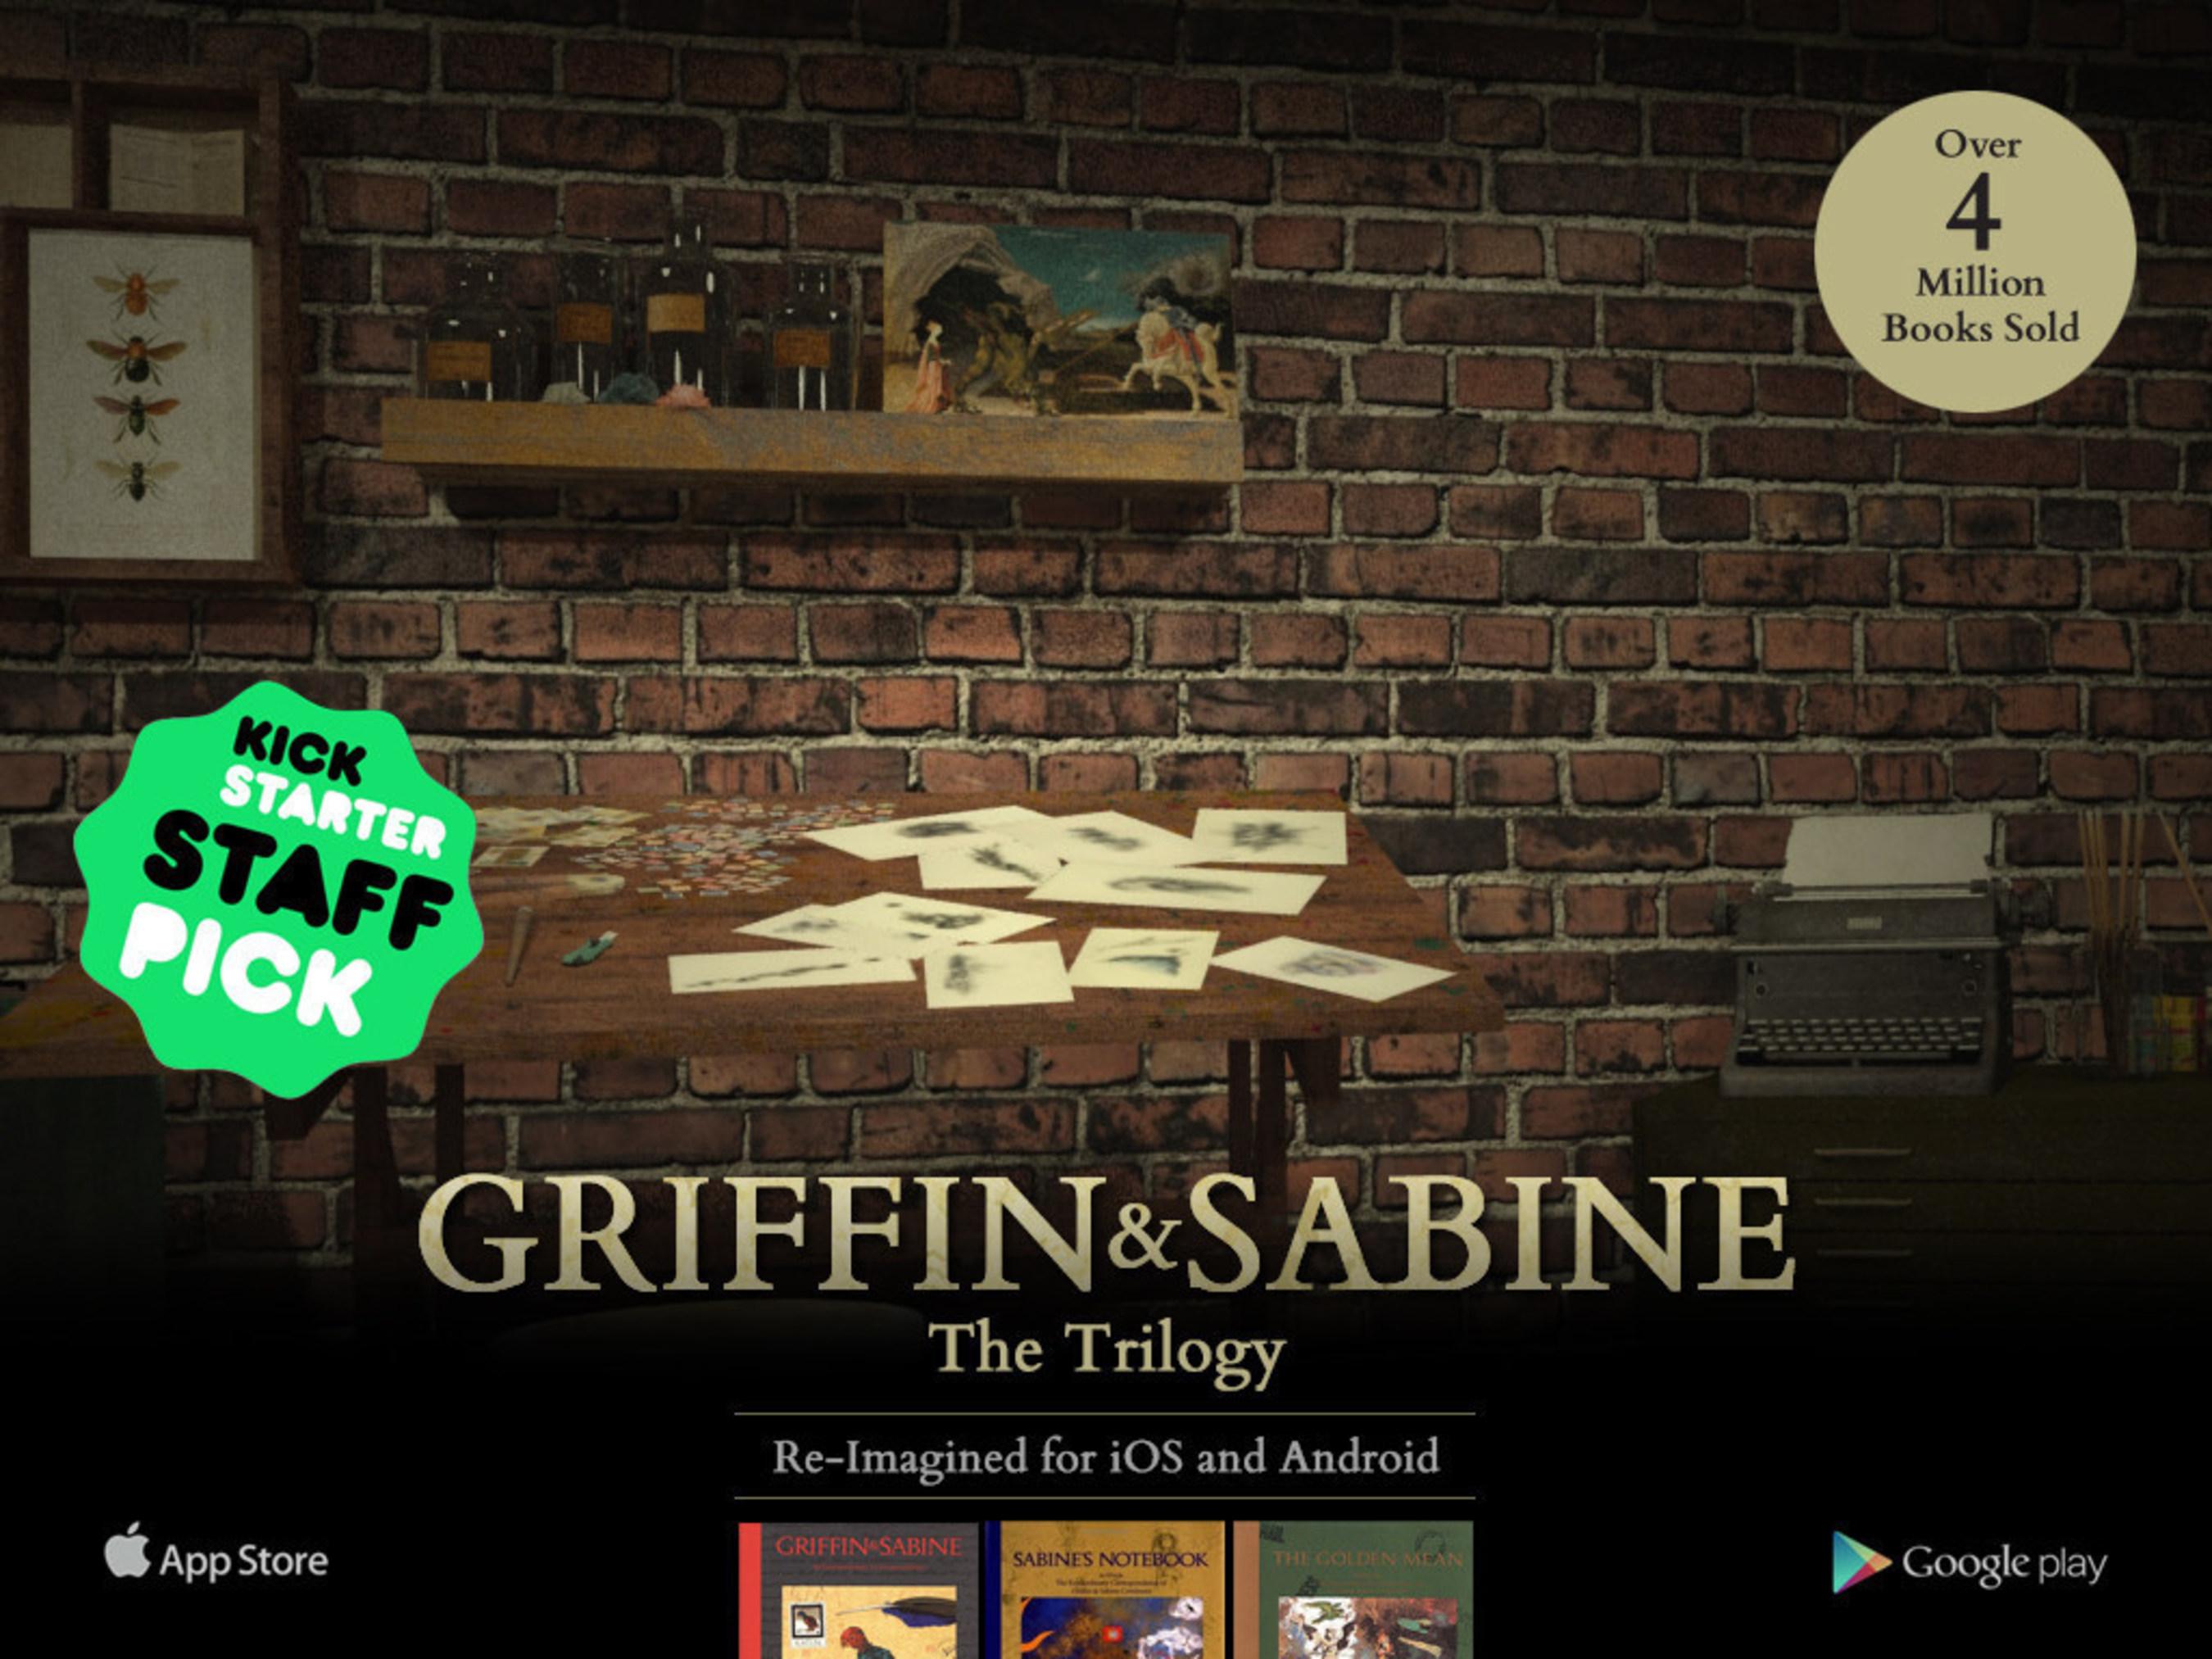 Kickstarter campaign Announced for Nick Bantock, Griffin & Sabine App Trilogy